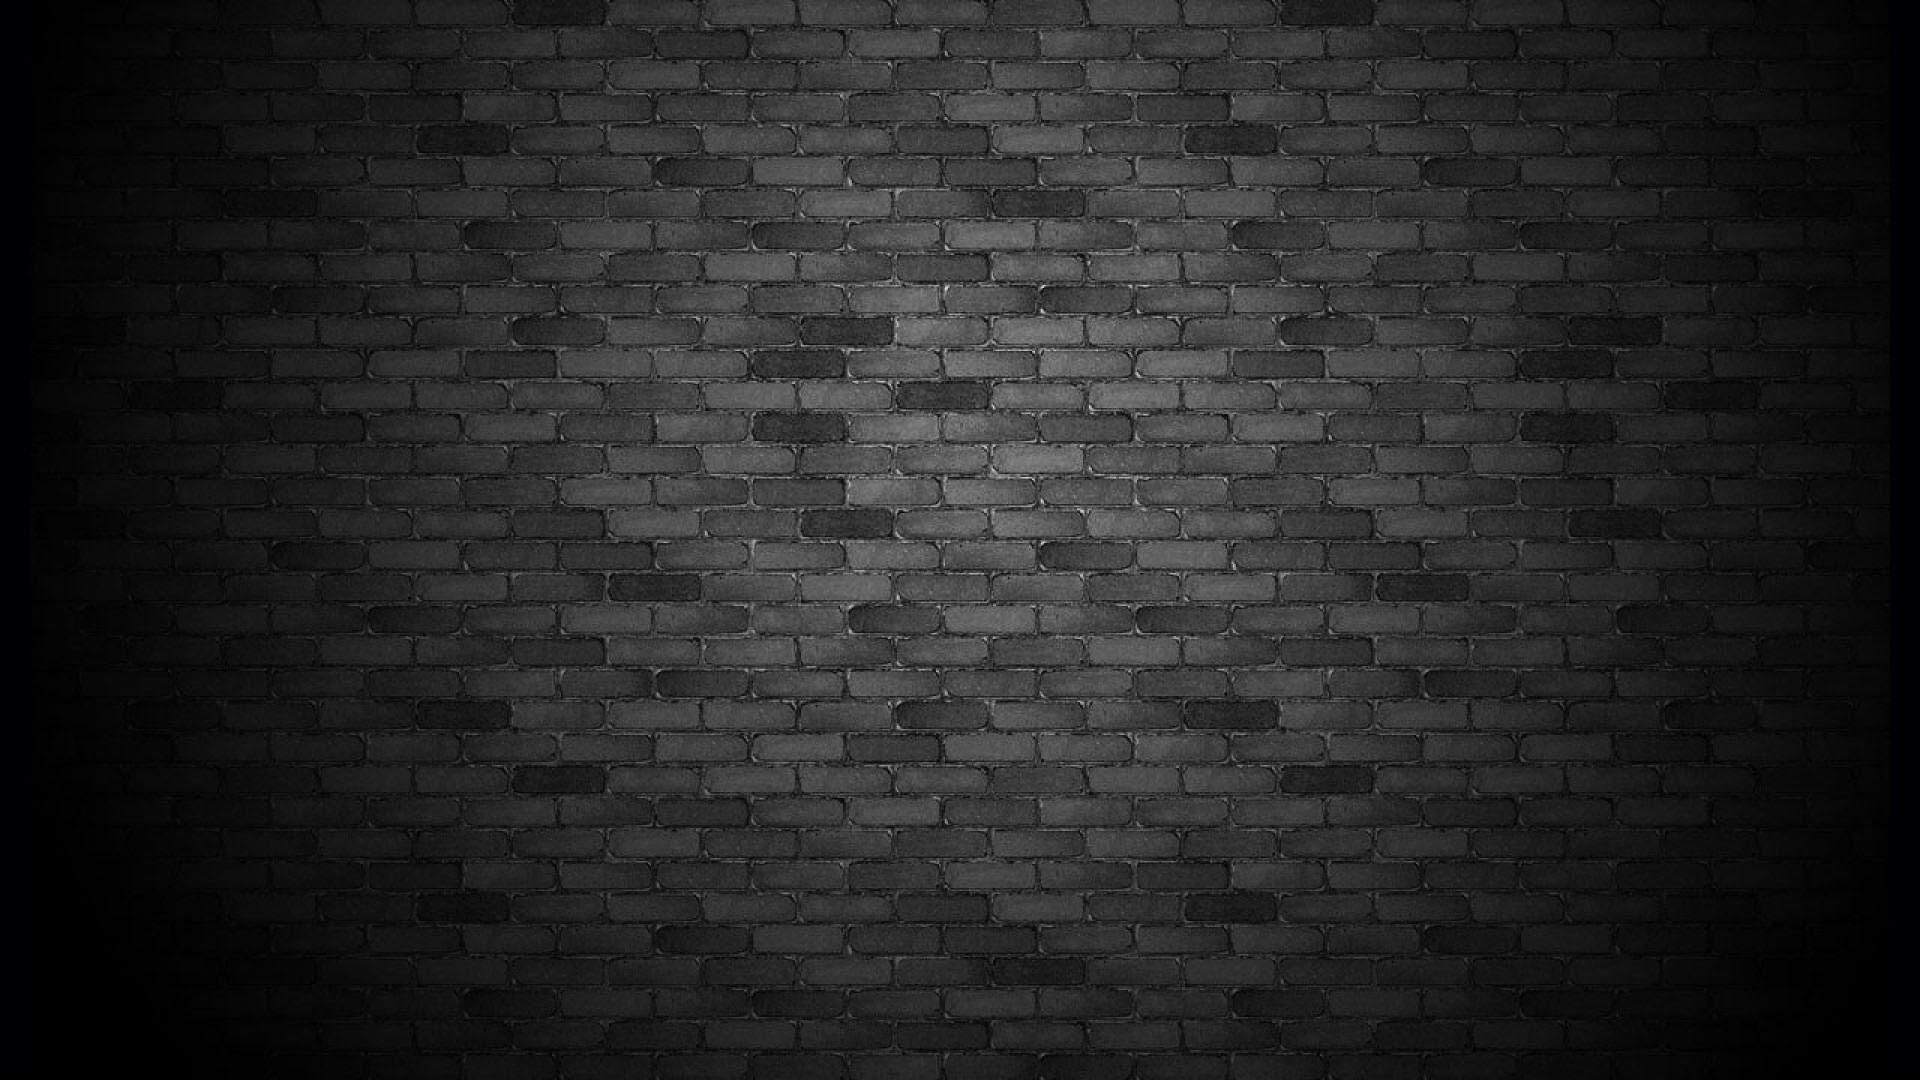 Vinyl Custom Photography Backdrops Brick Wall And Wood Floor Theme